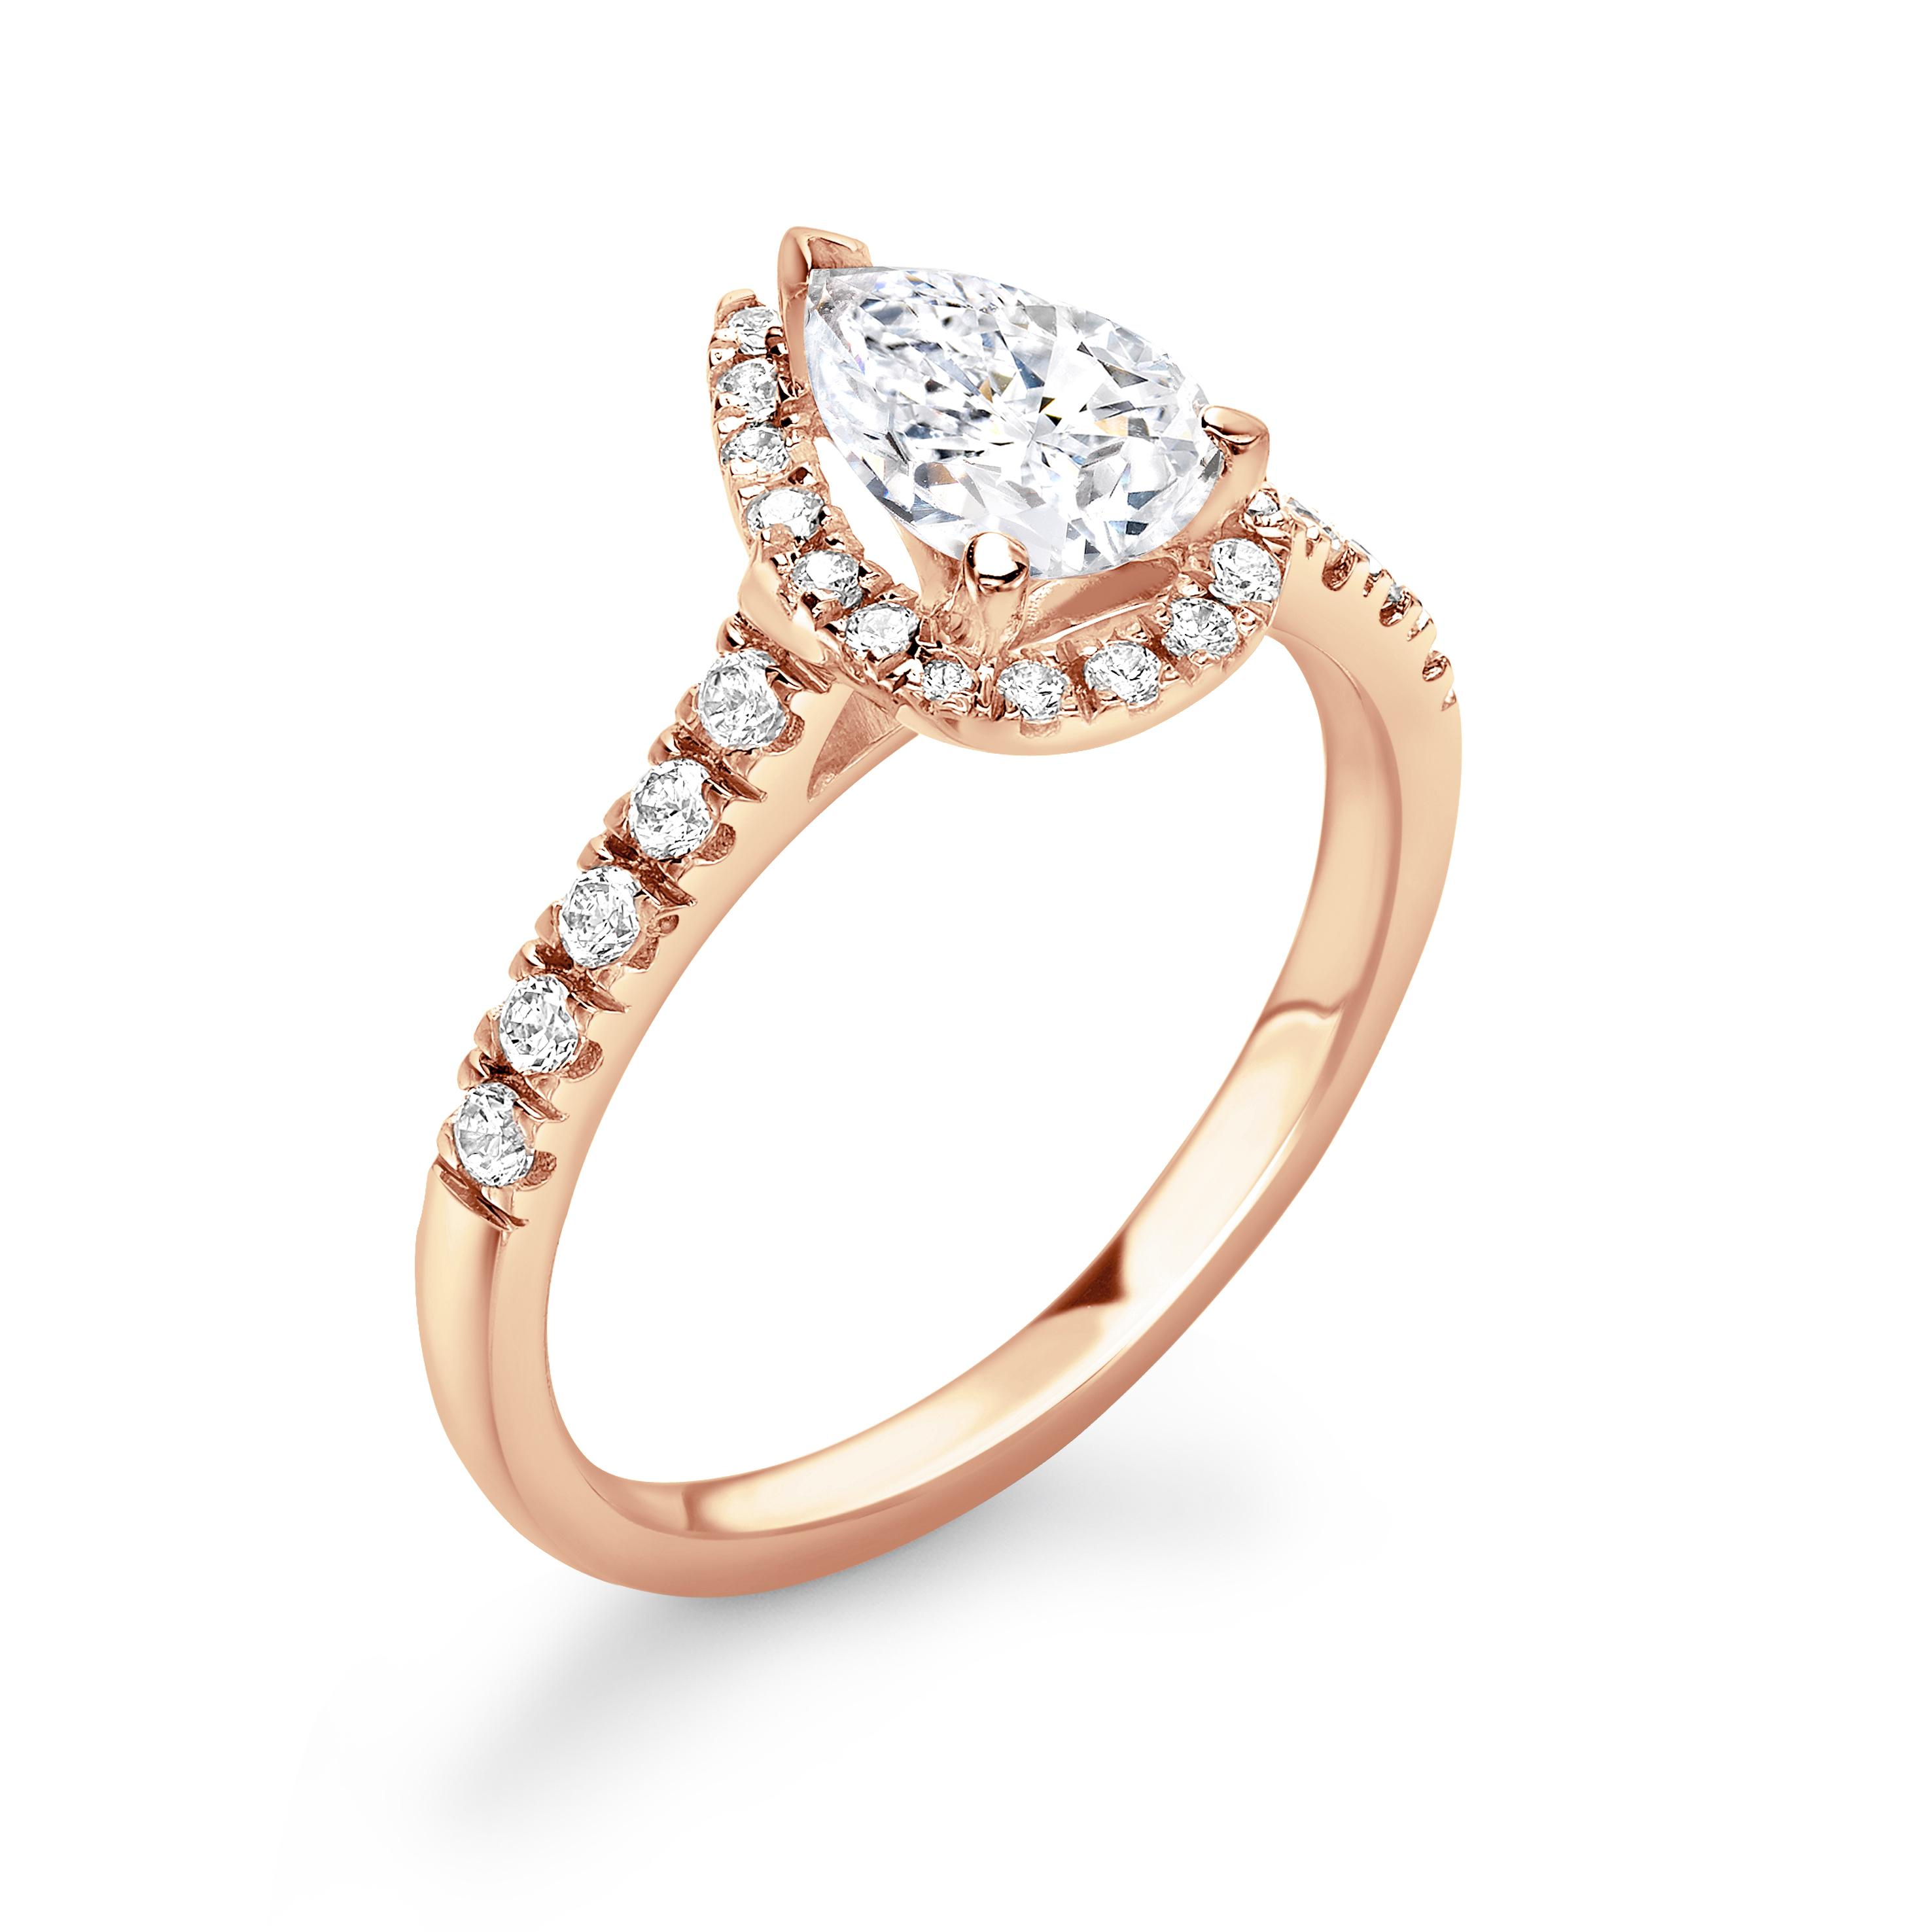 4 Prong Setting Pear Shape U Prong Set Halo Diamond Engagement Rings